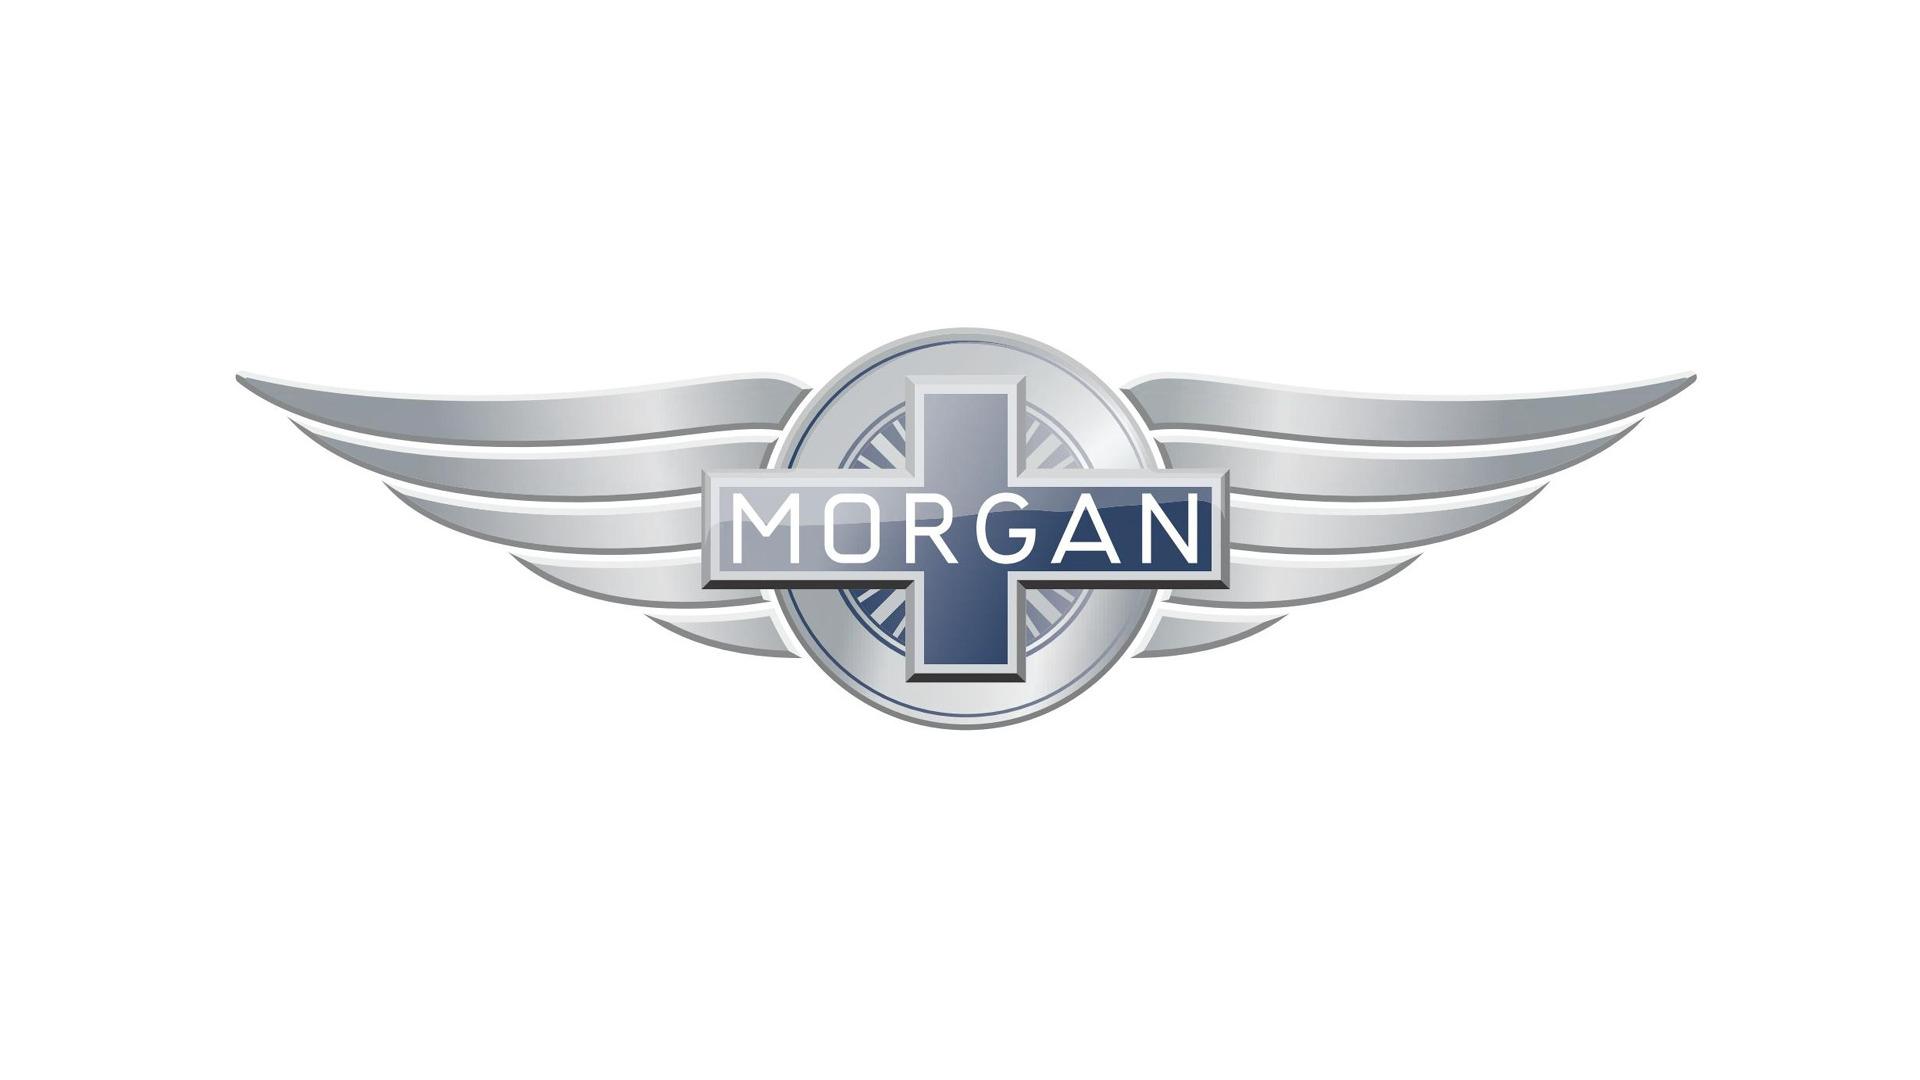 Imagen logo de Morgan